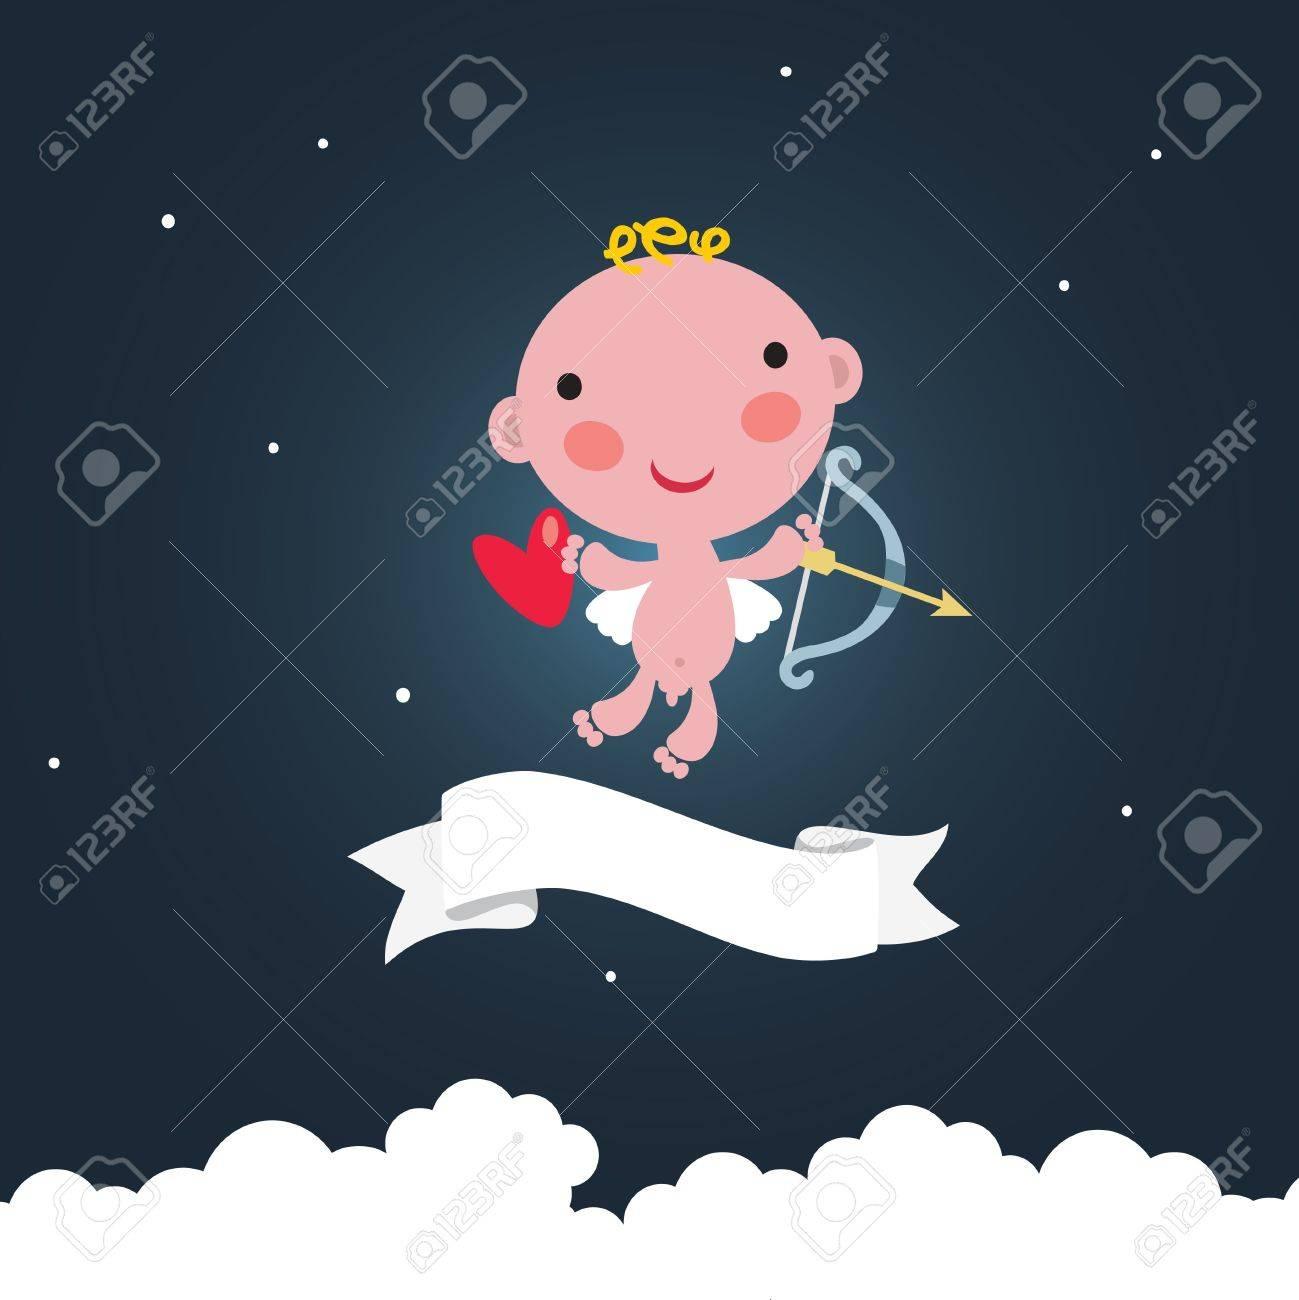 Cute cupid in the dark sky. Stock Vector - 12072197